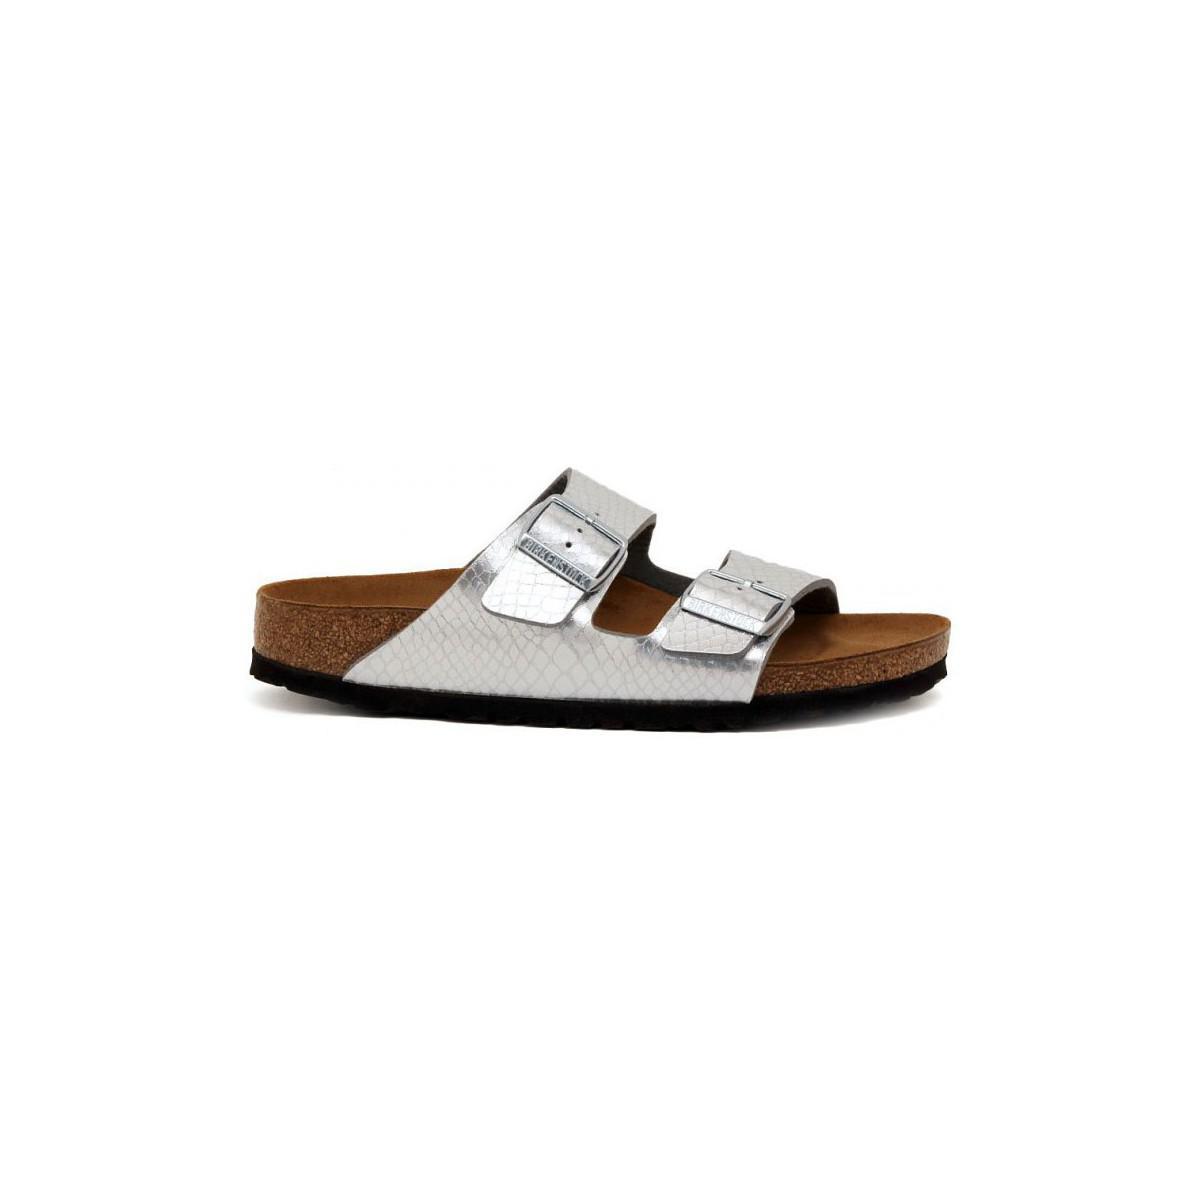 lyst birkenstock arizona silber women 39 s sandals in. Black Bedroom Furniture Sets. Home Design Ideas